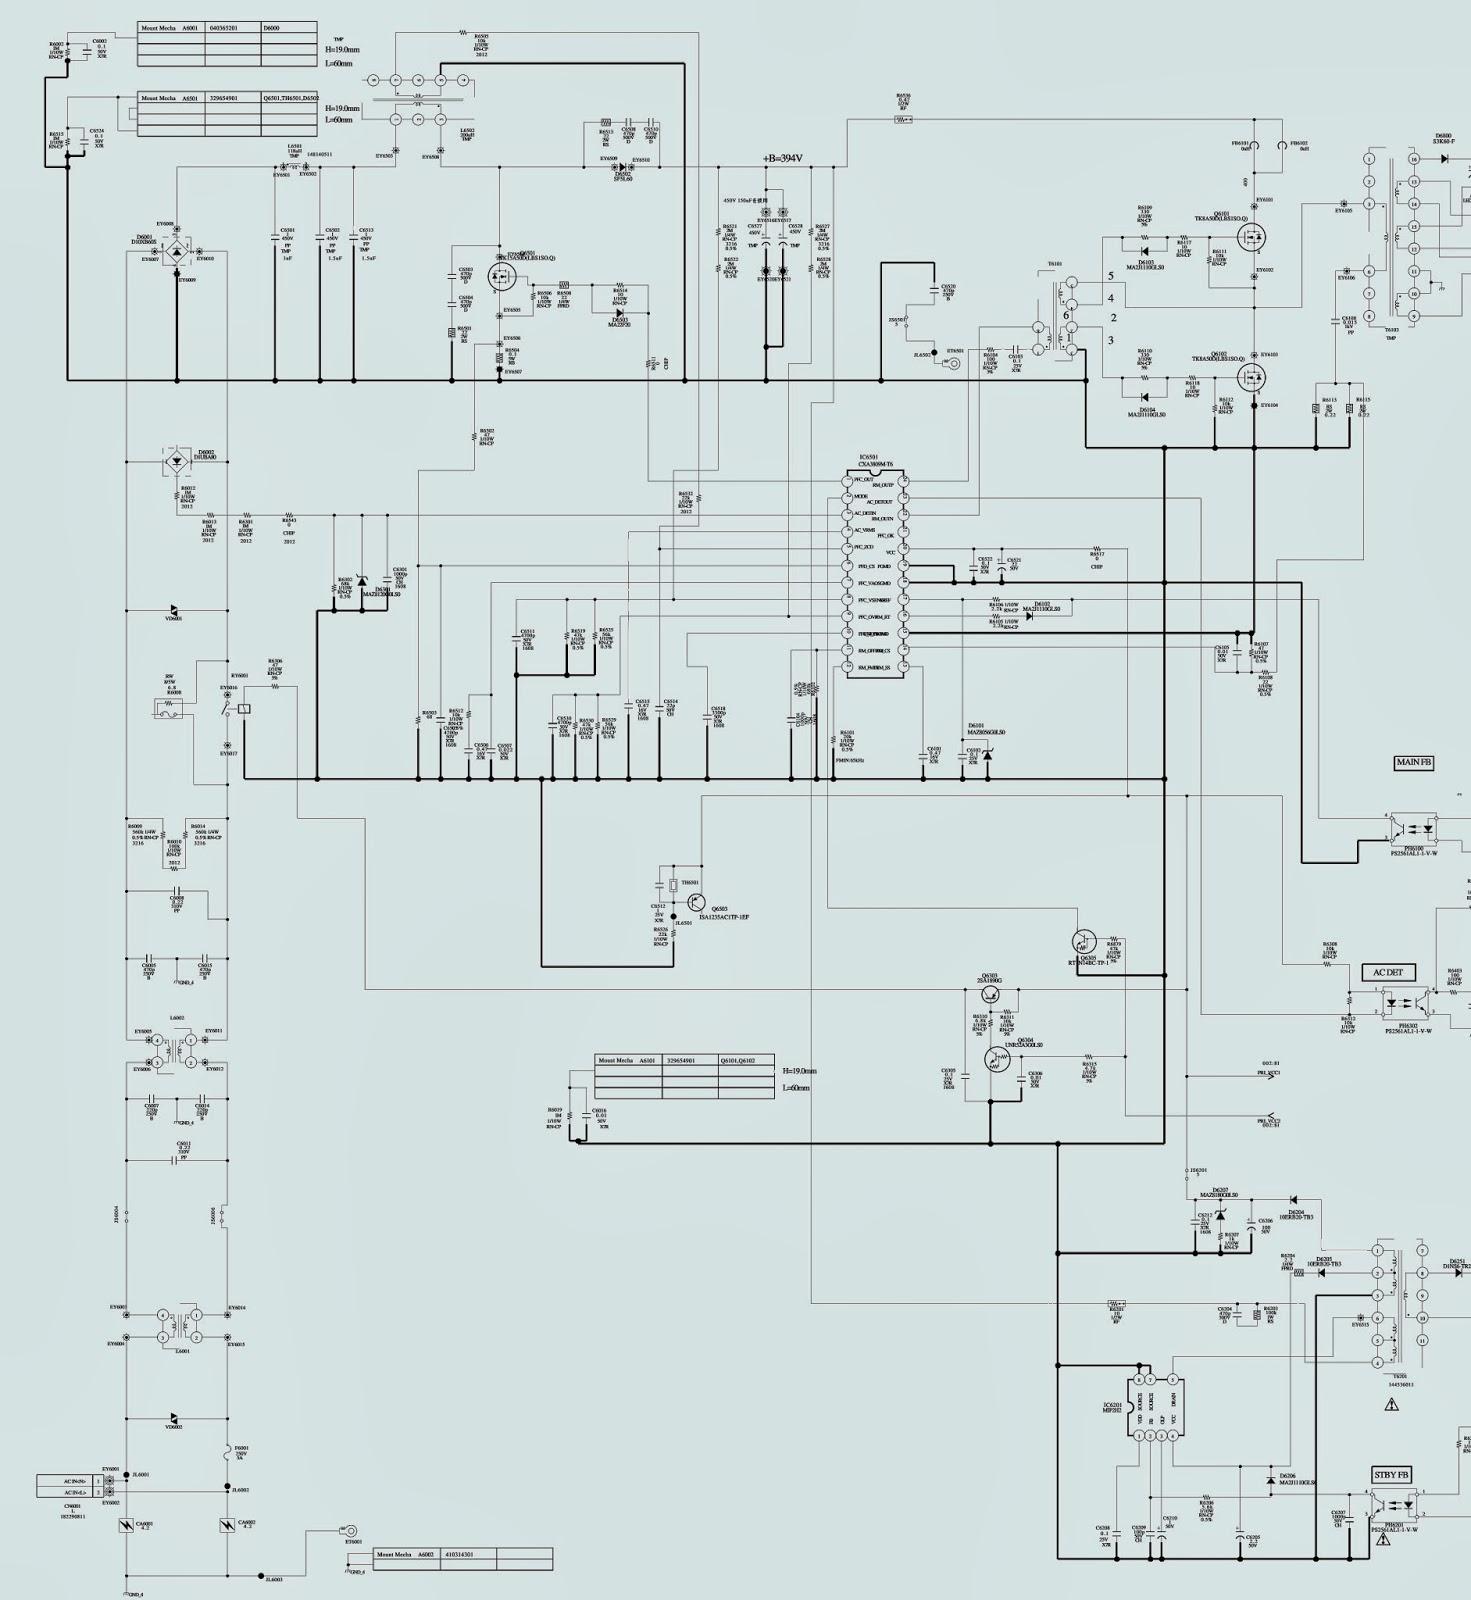 playstation 2 power supply schematic